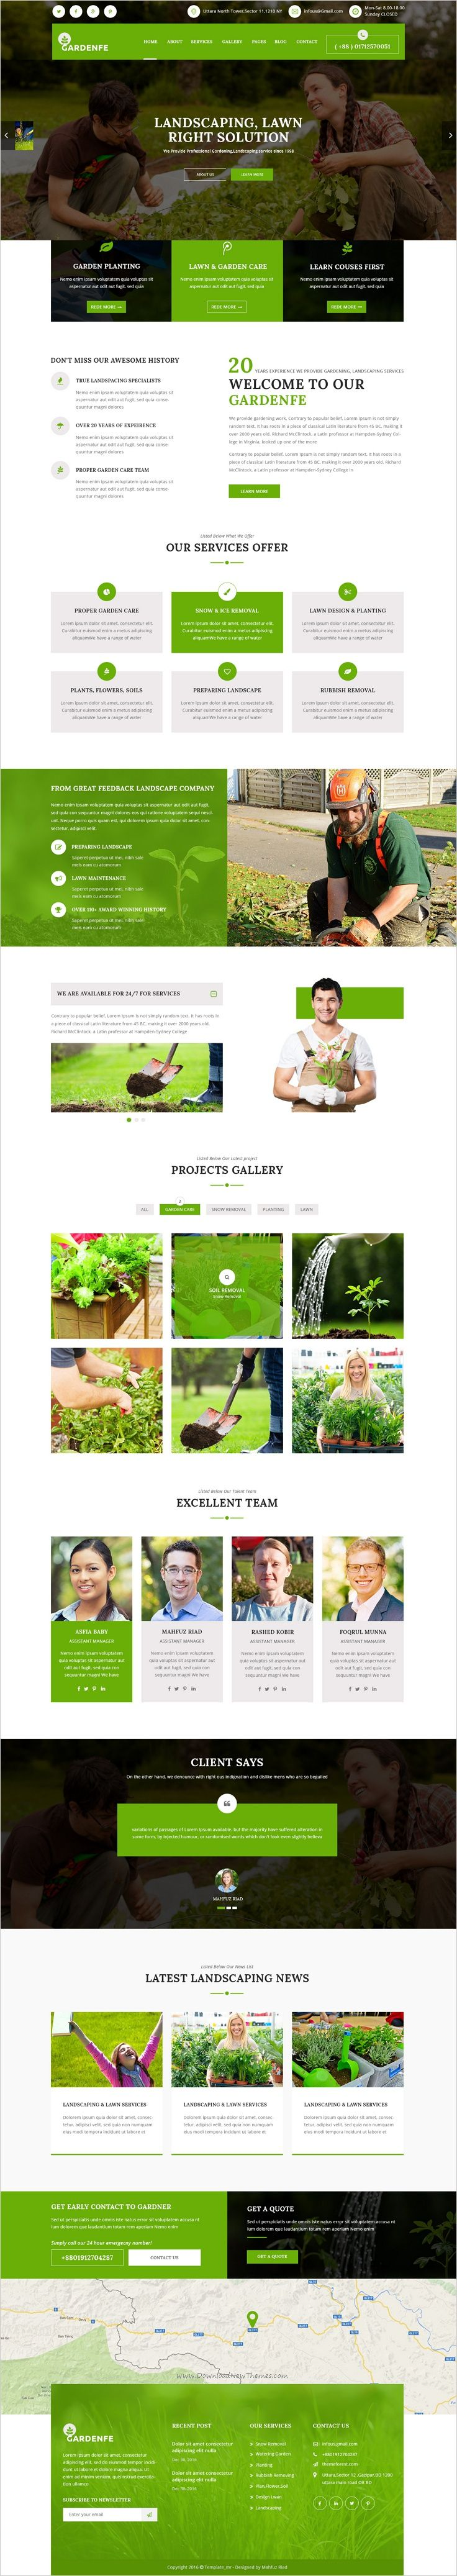 the 25 best lawn service ideas on pinterest